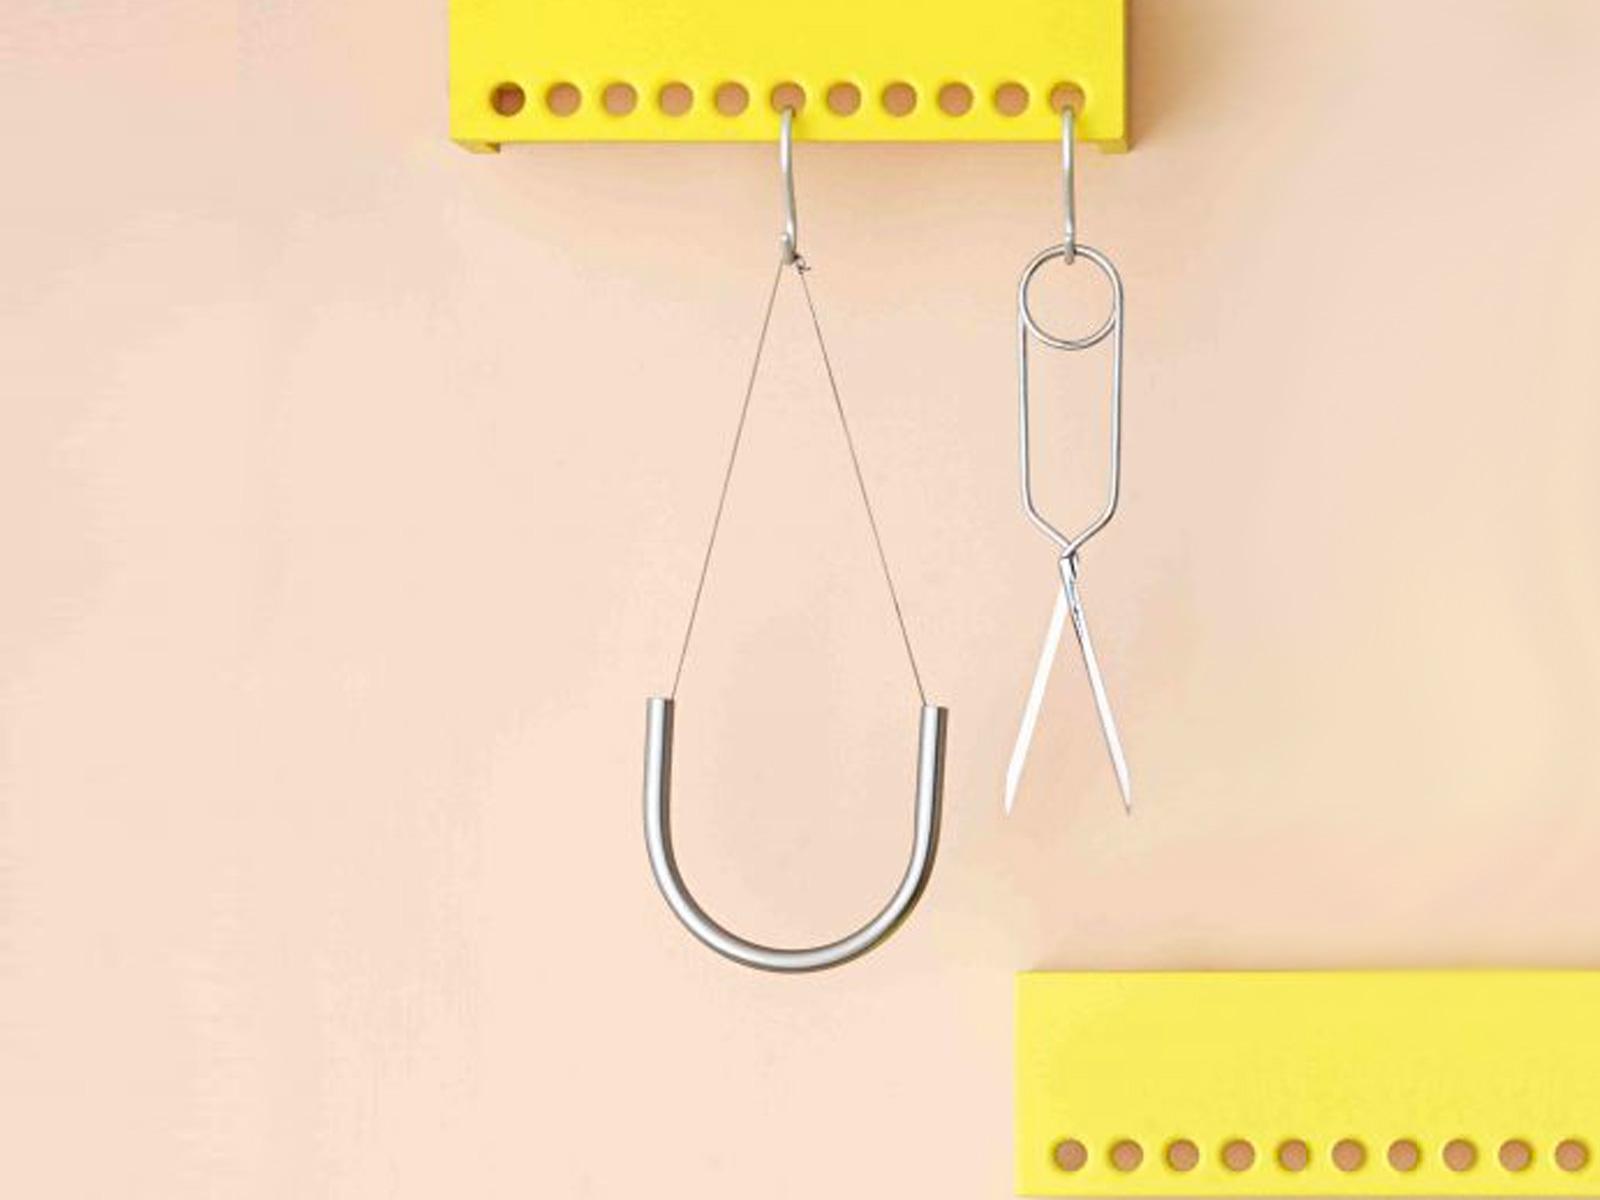 Nomess-Spring-Scissors3